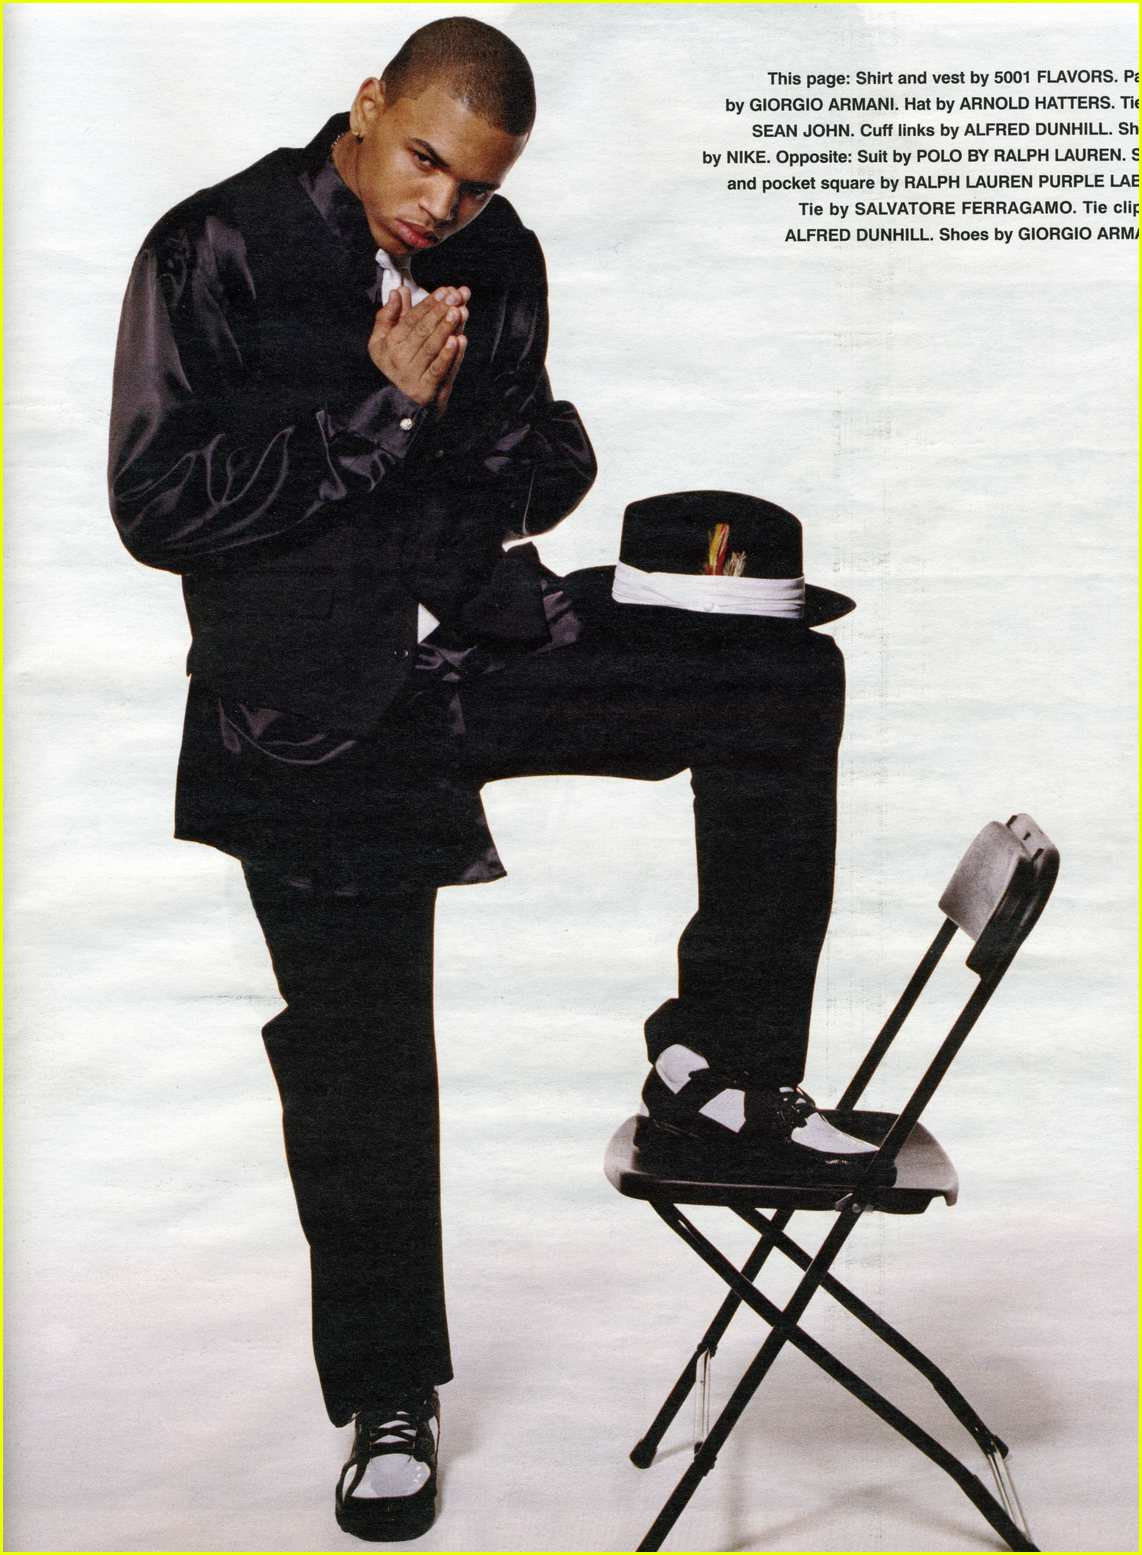 Chris Brown 2007 Album